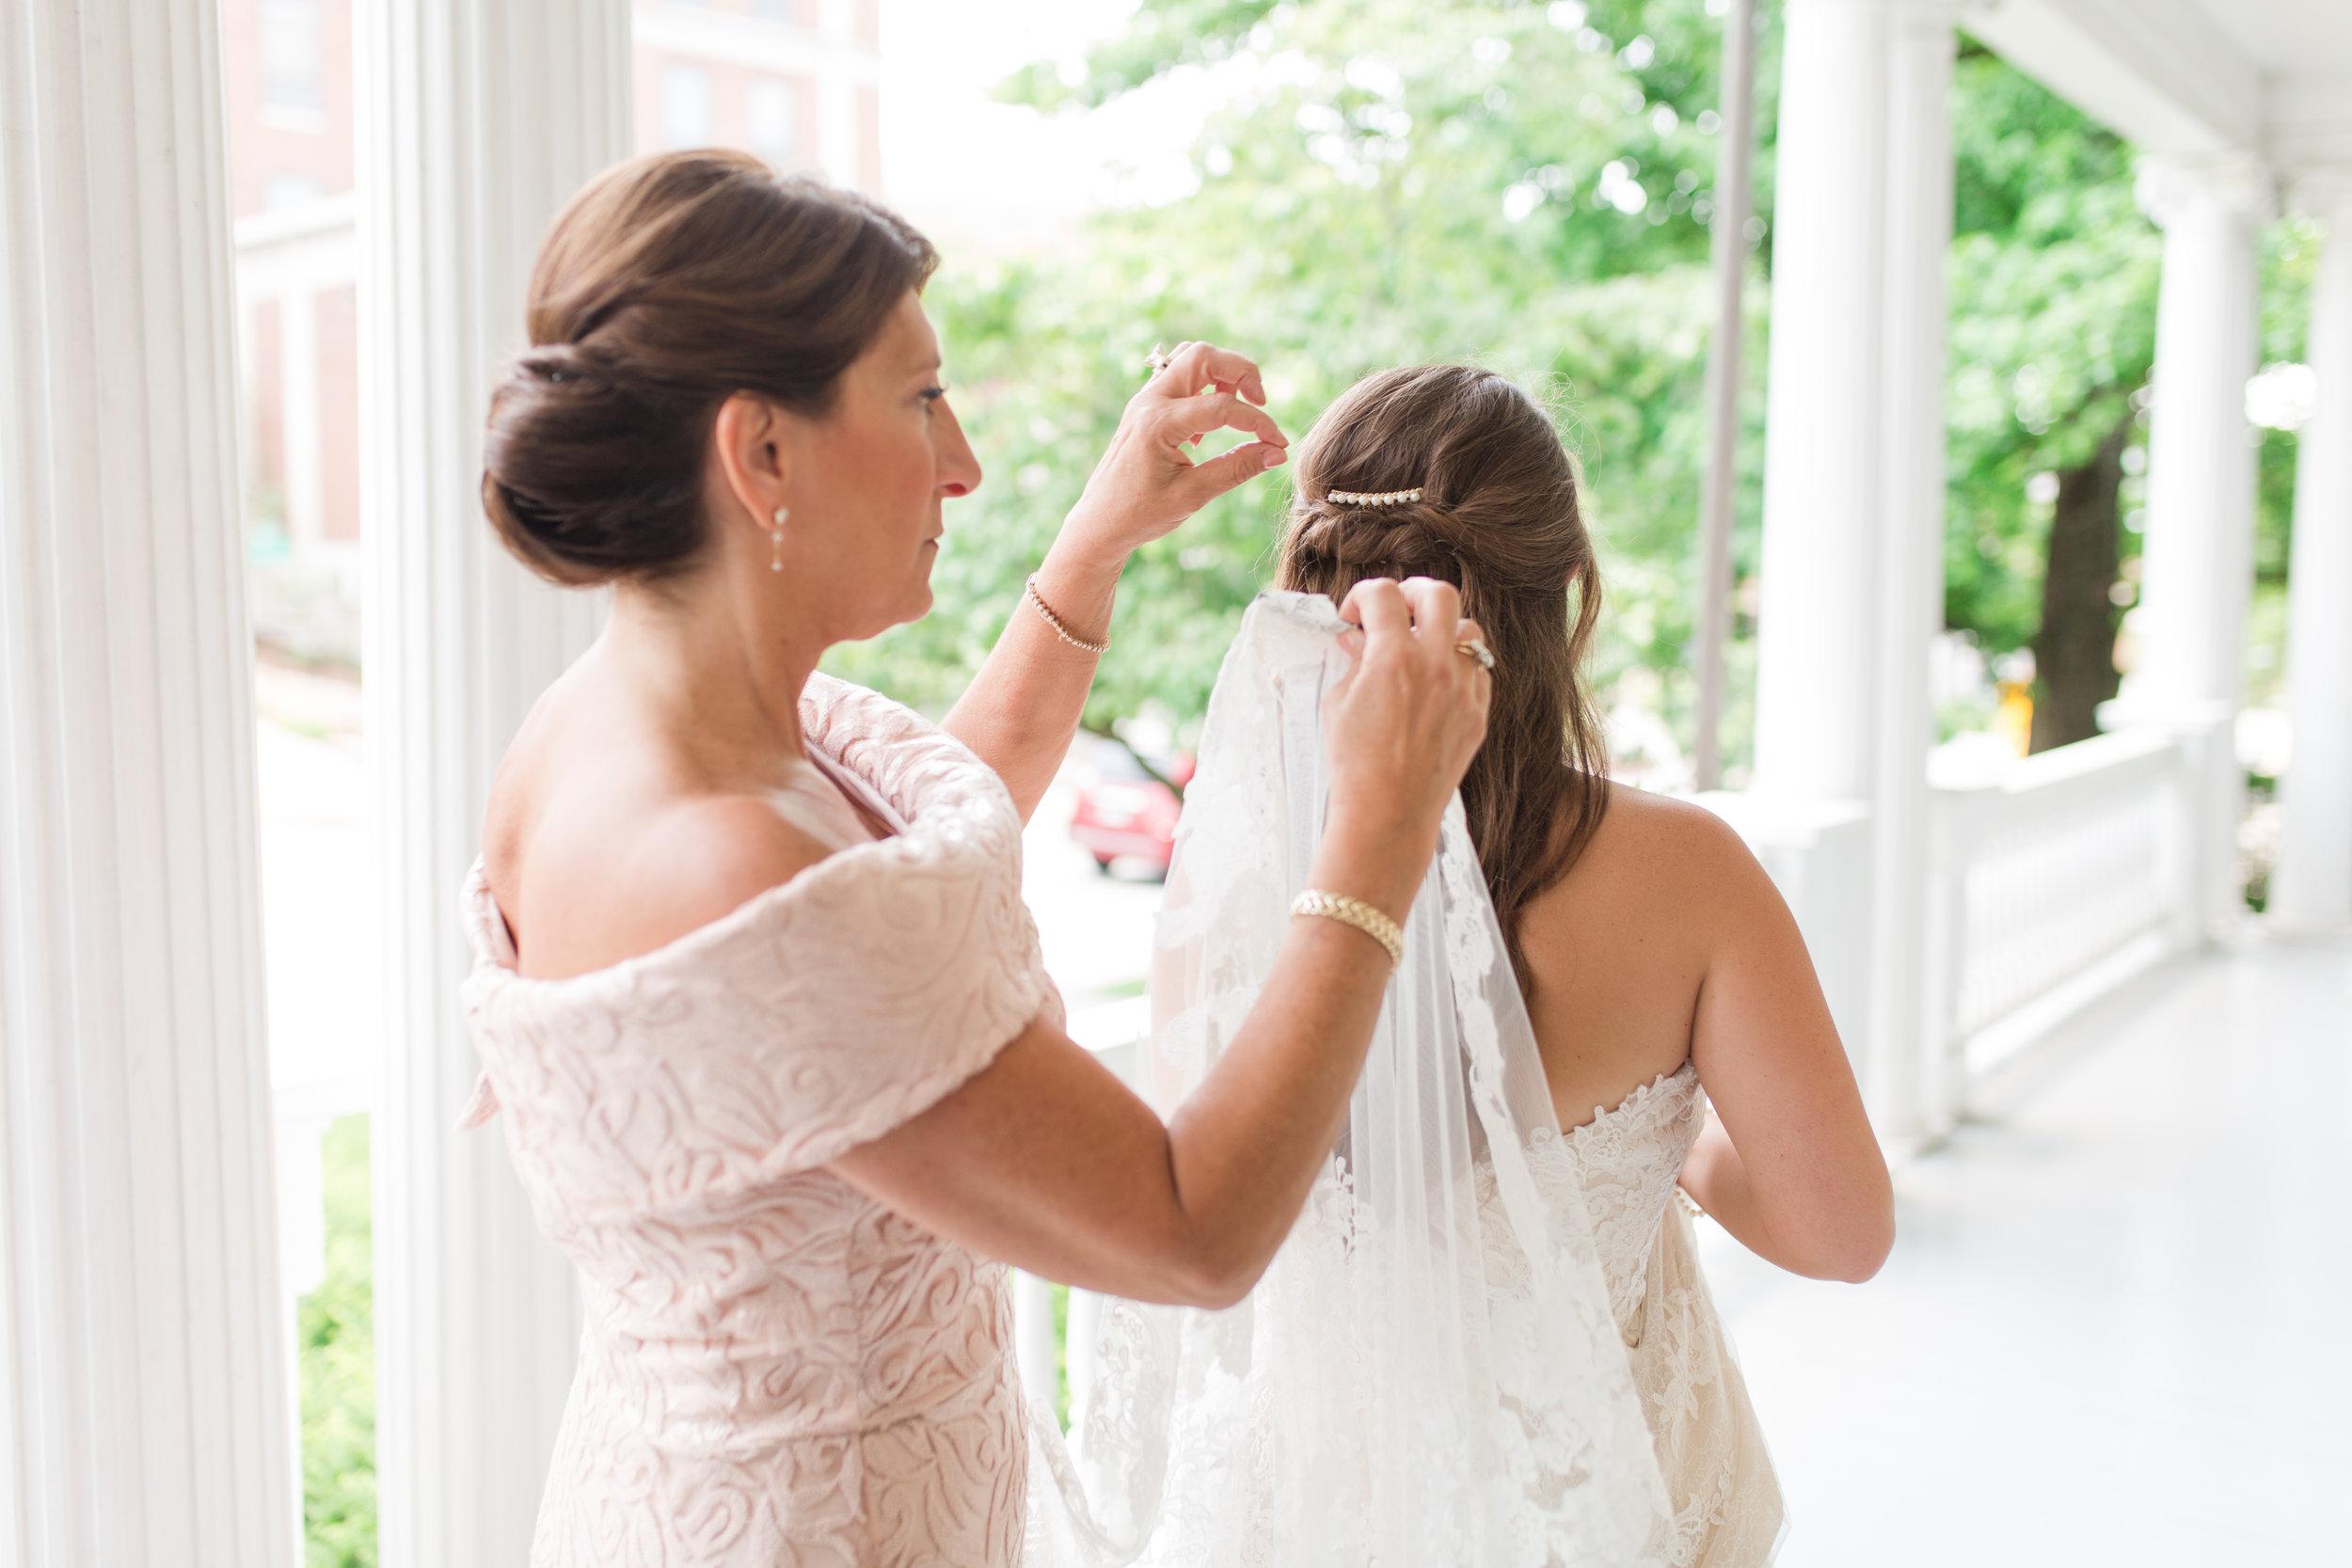 bridals and bridal party-3.jpg